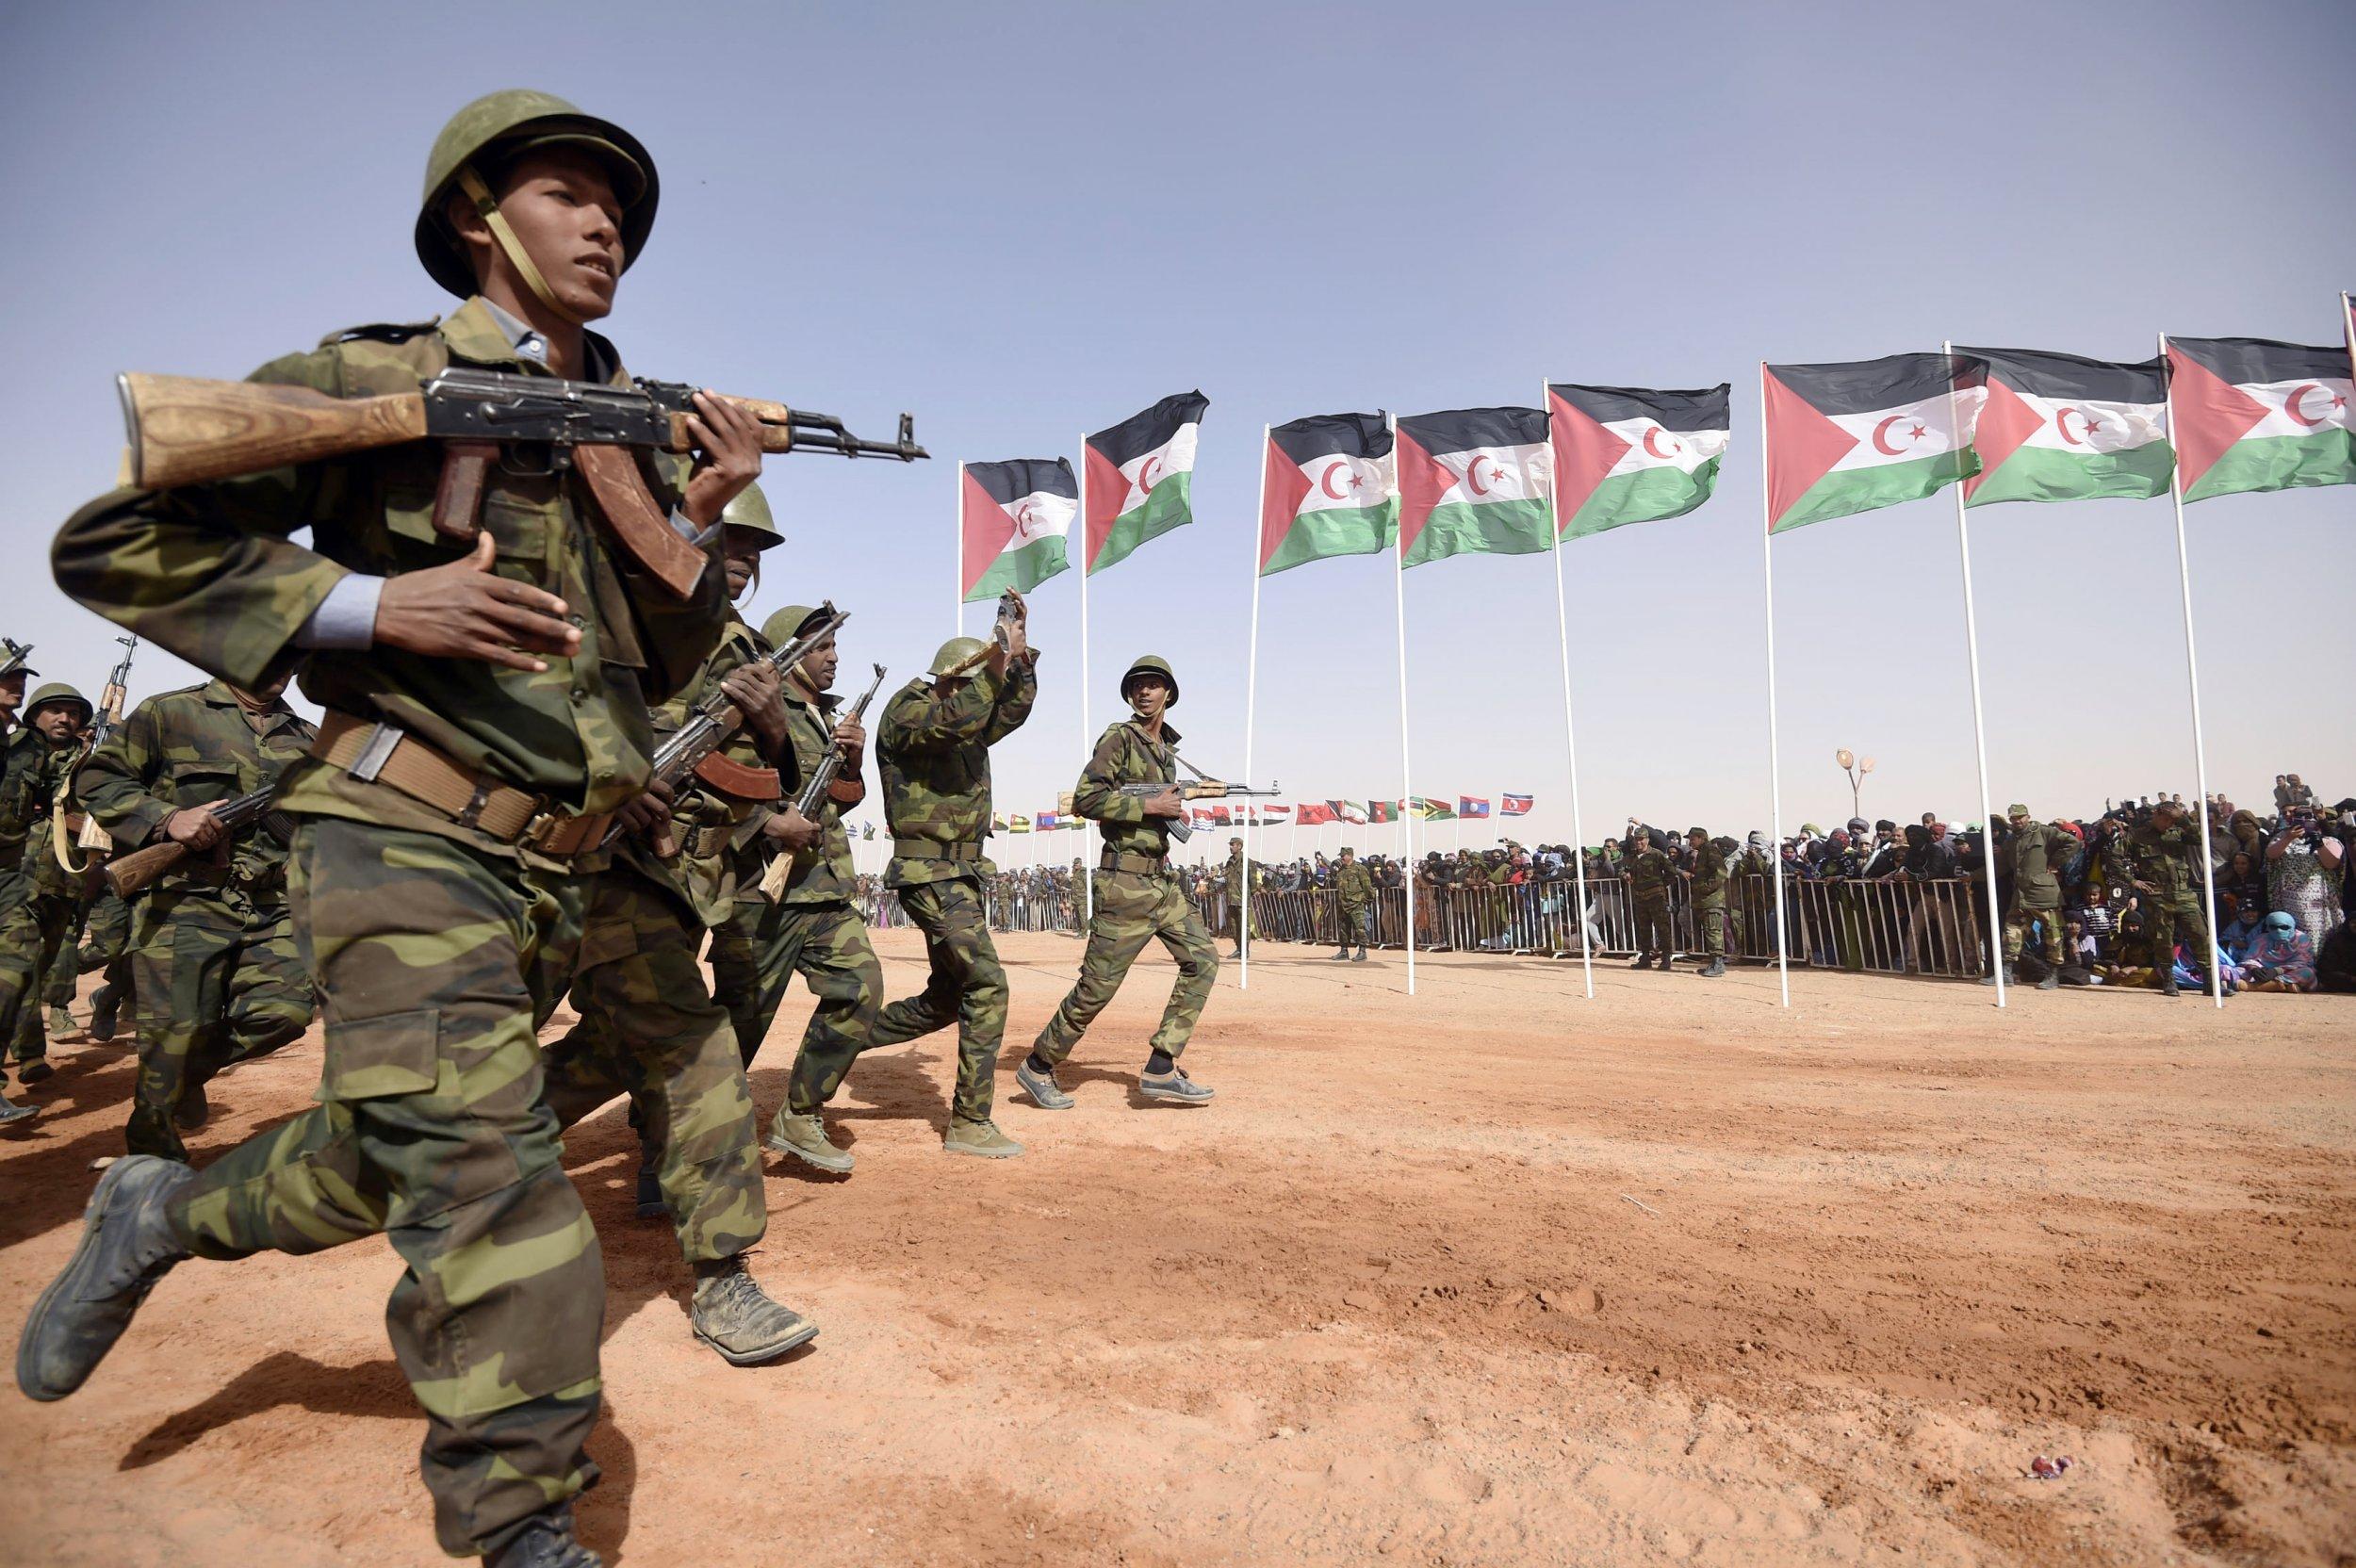 Sahrawi soldiers parade in Algeria.